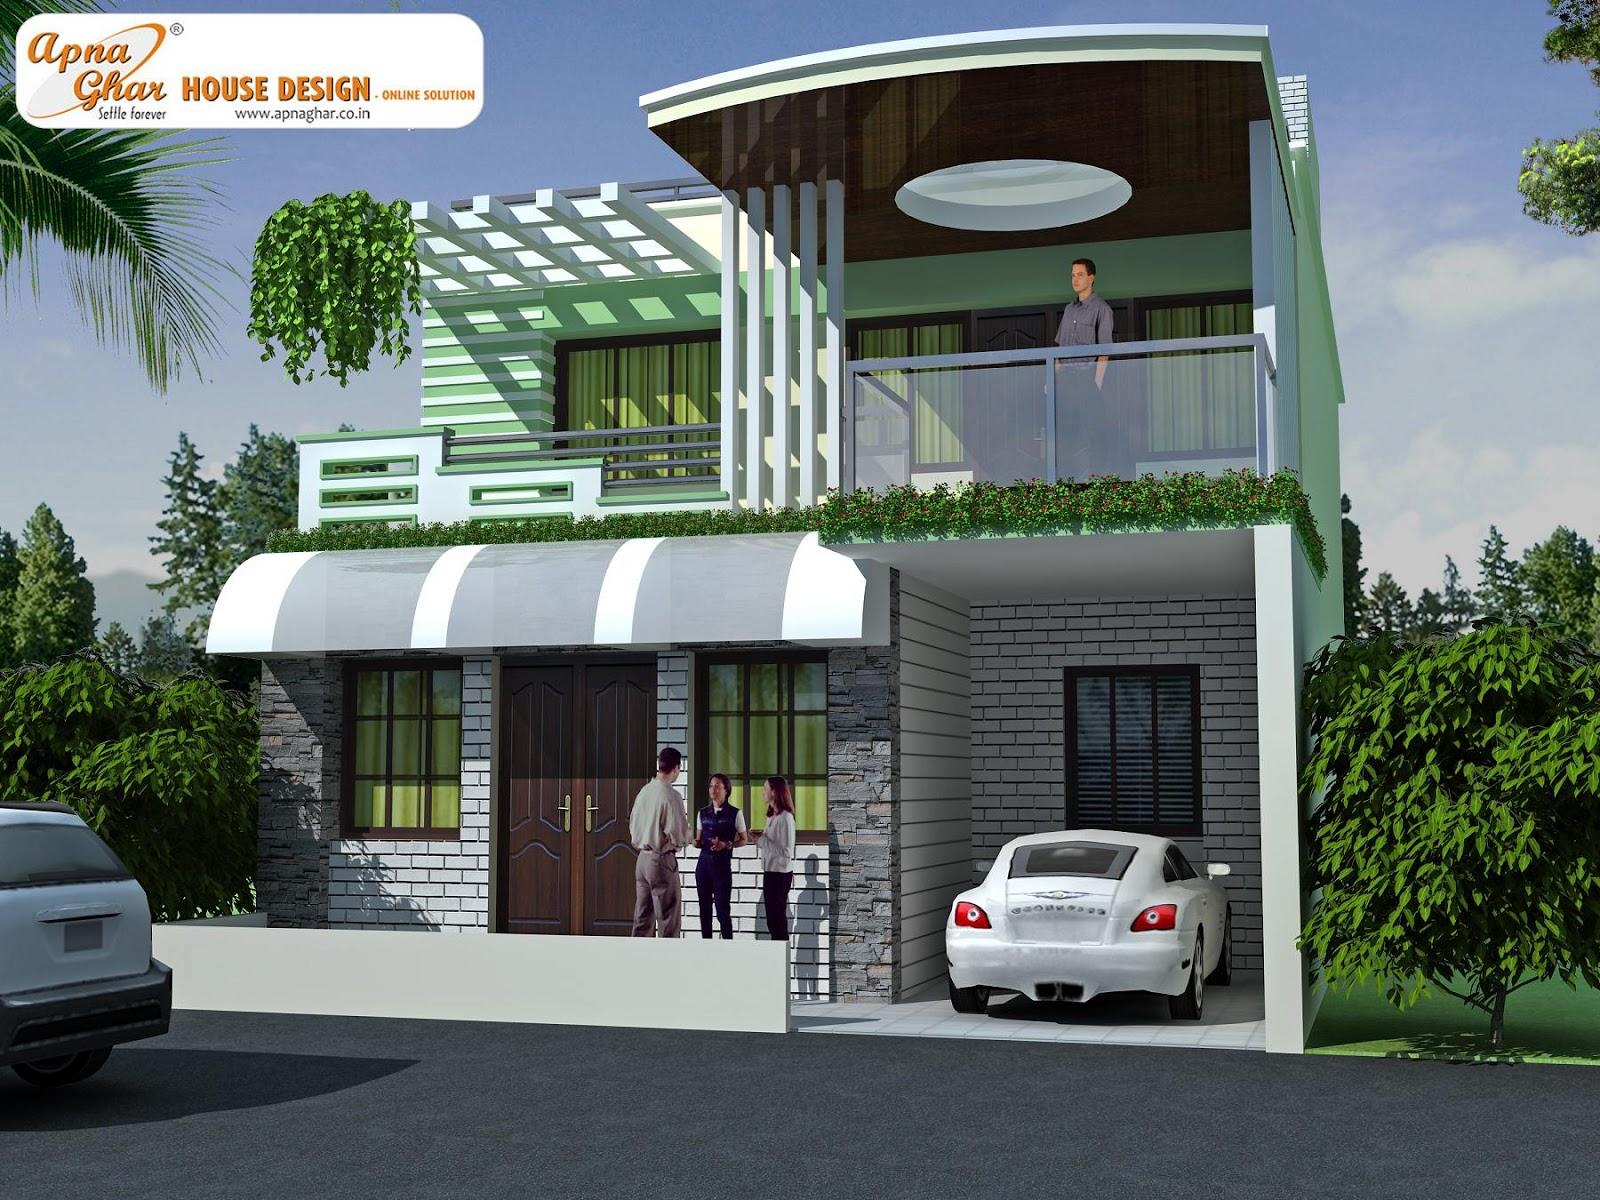 View Plan : http://apnaghar.co.in/house-design-199.aspx